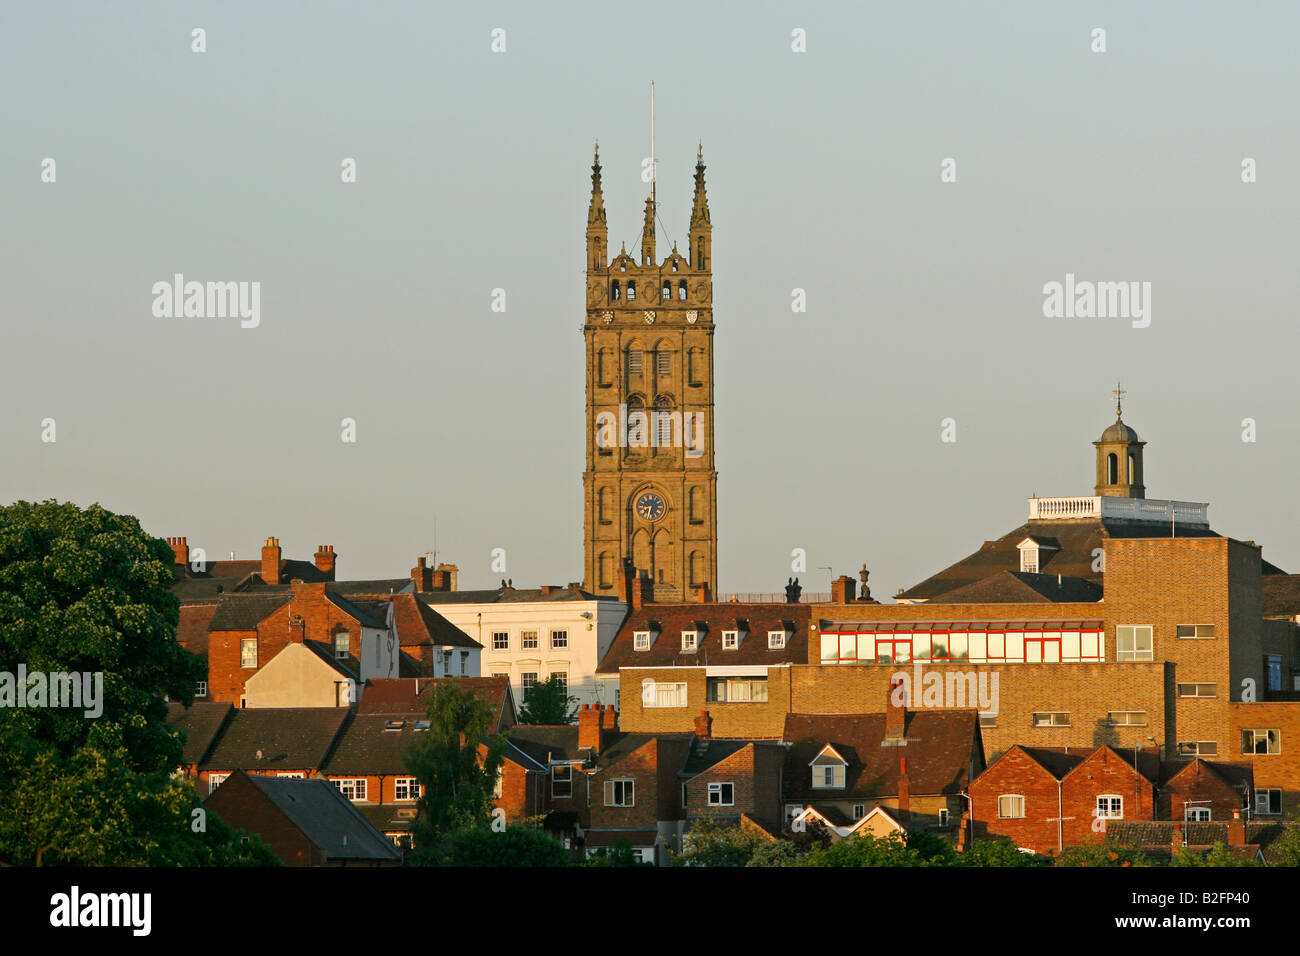 St Mary s Church Warwick England UK - Stock Image